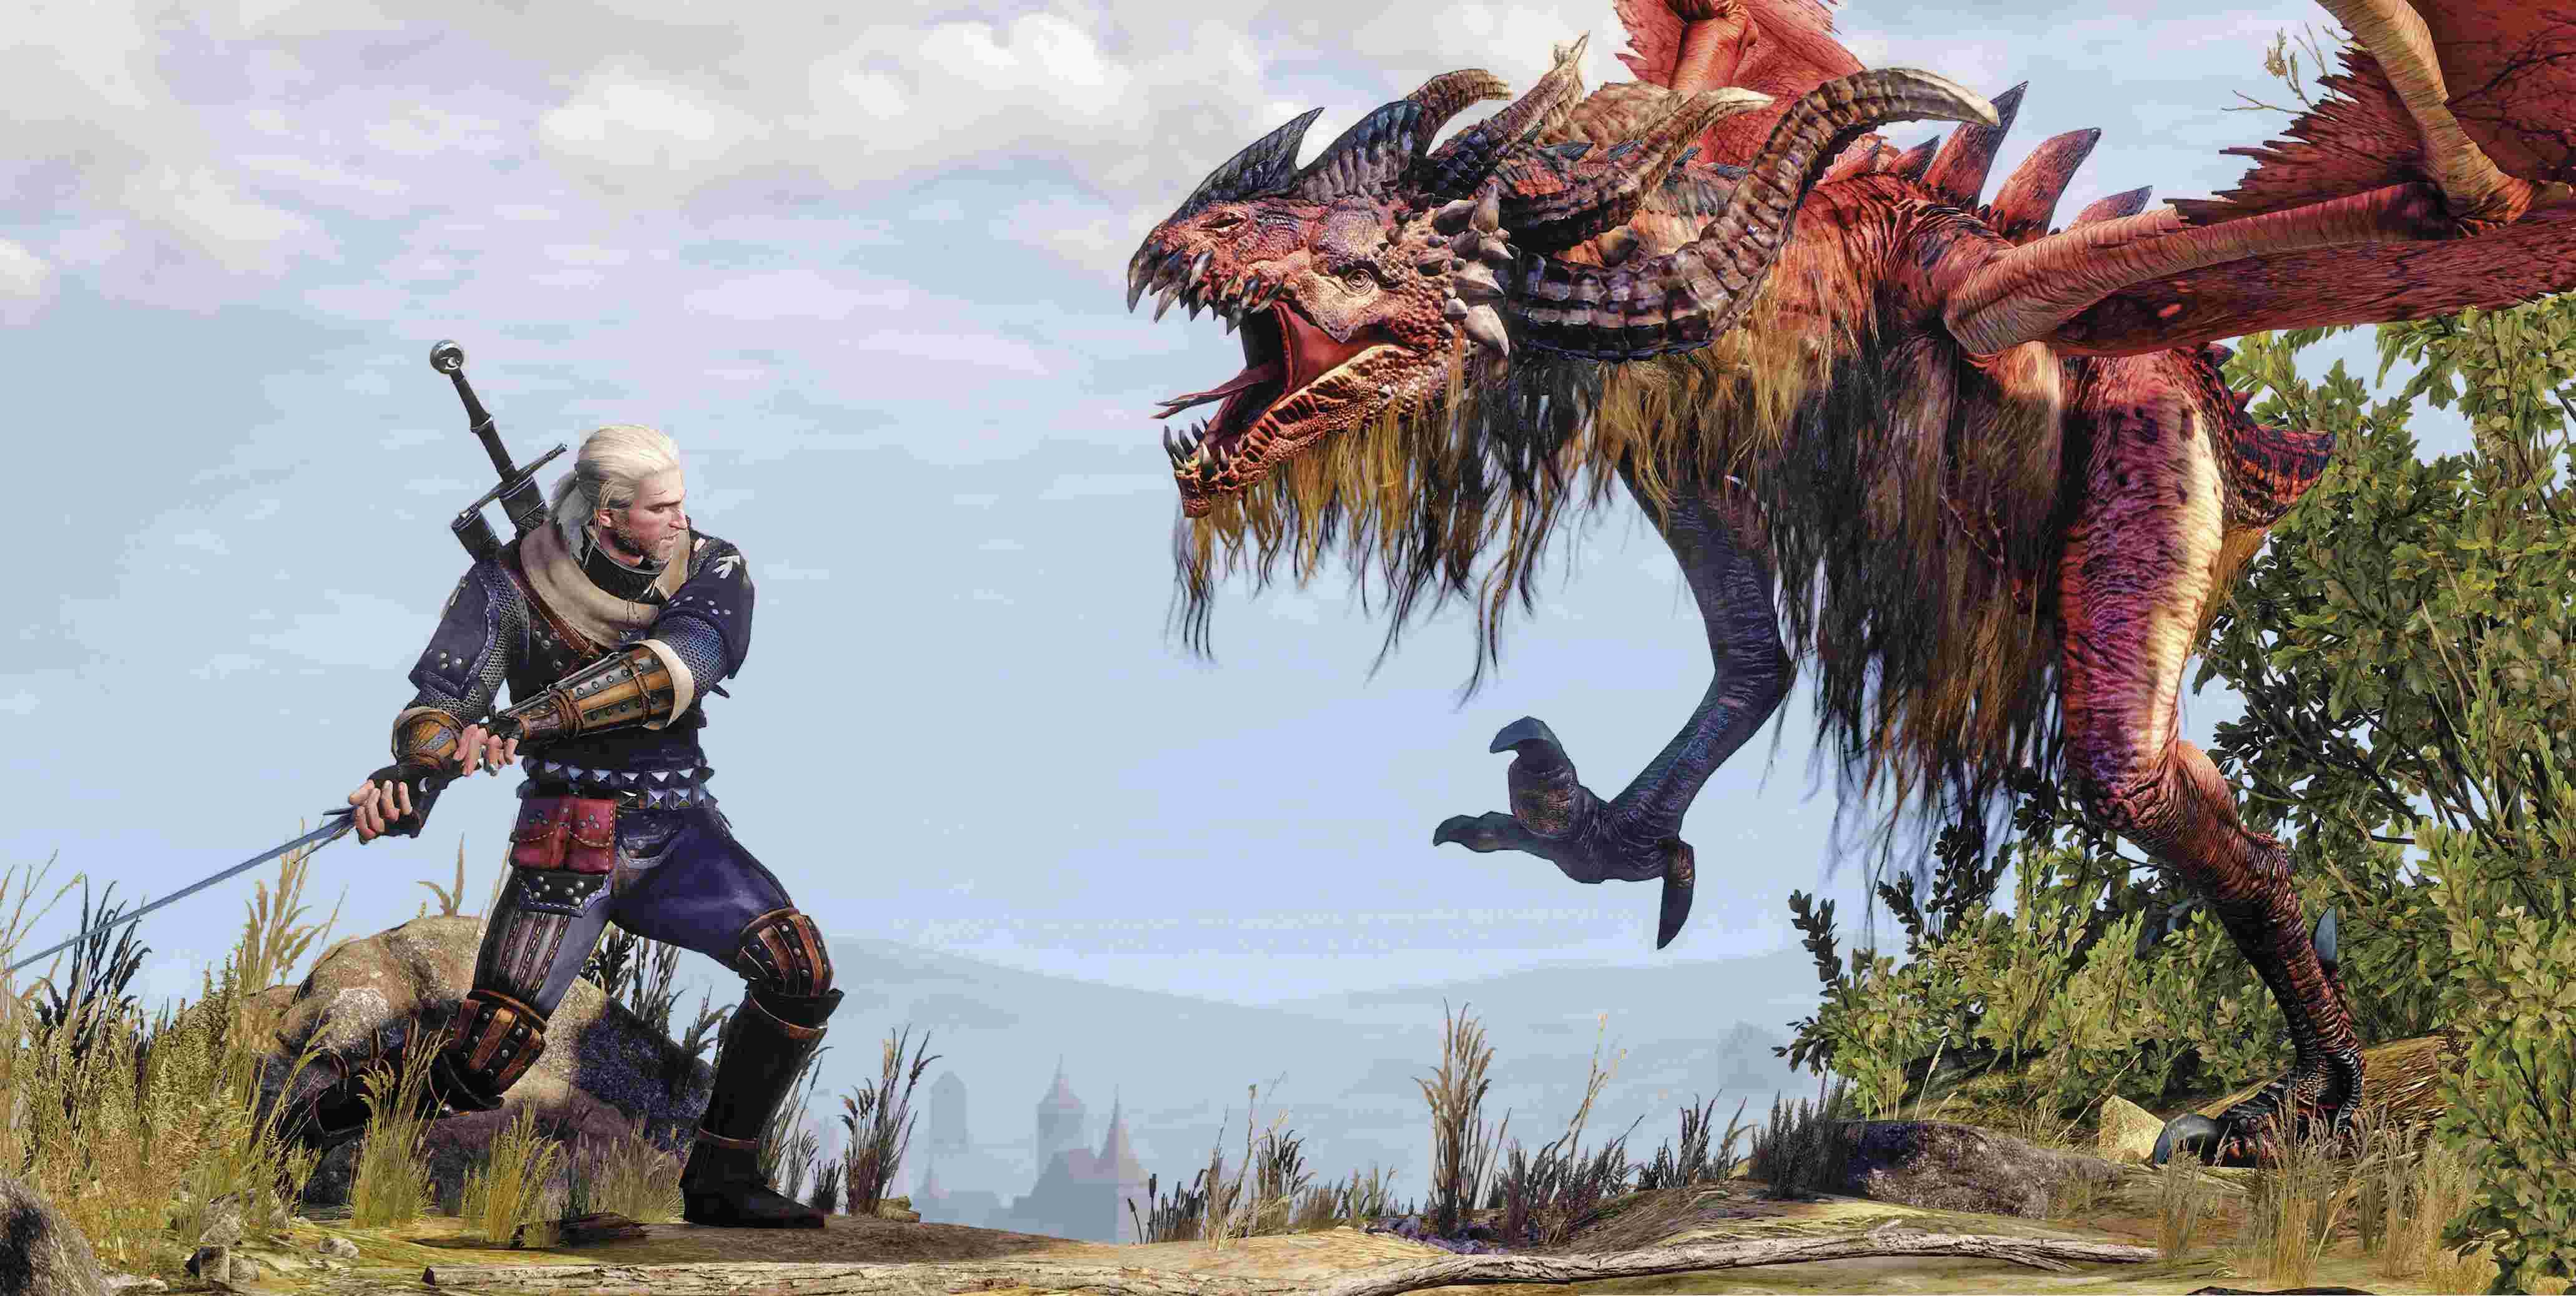 Witcher-3-en-cuatro-imágenes